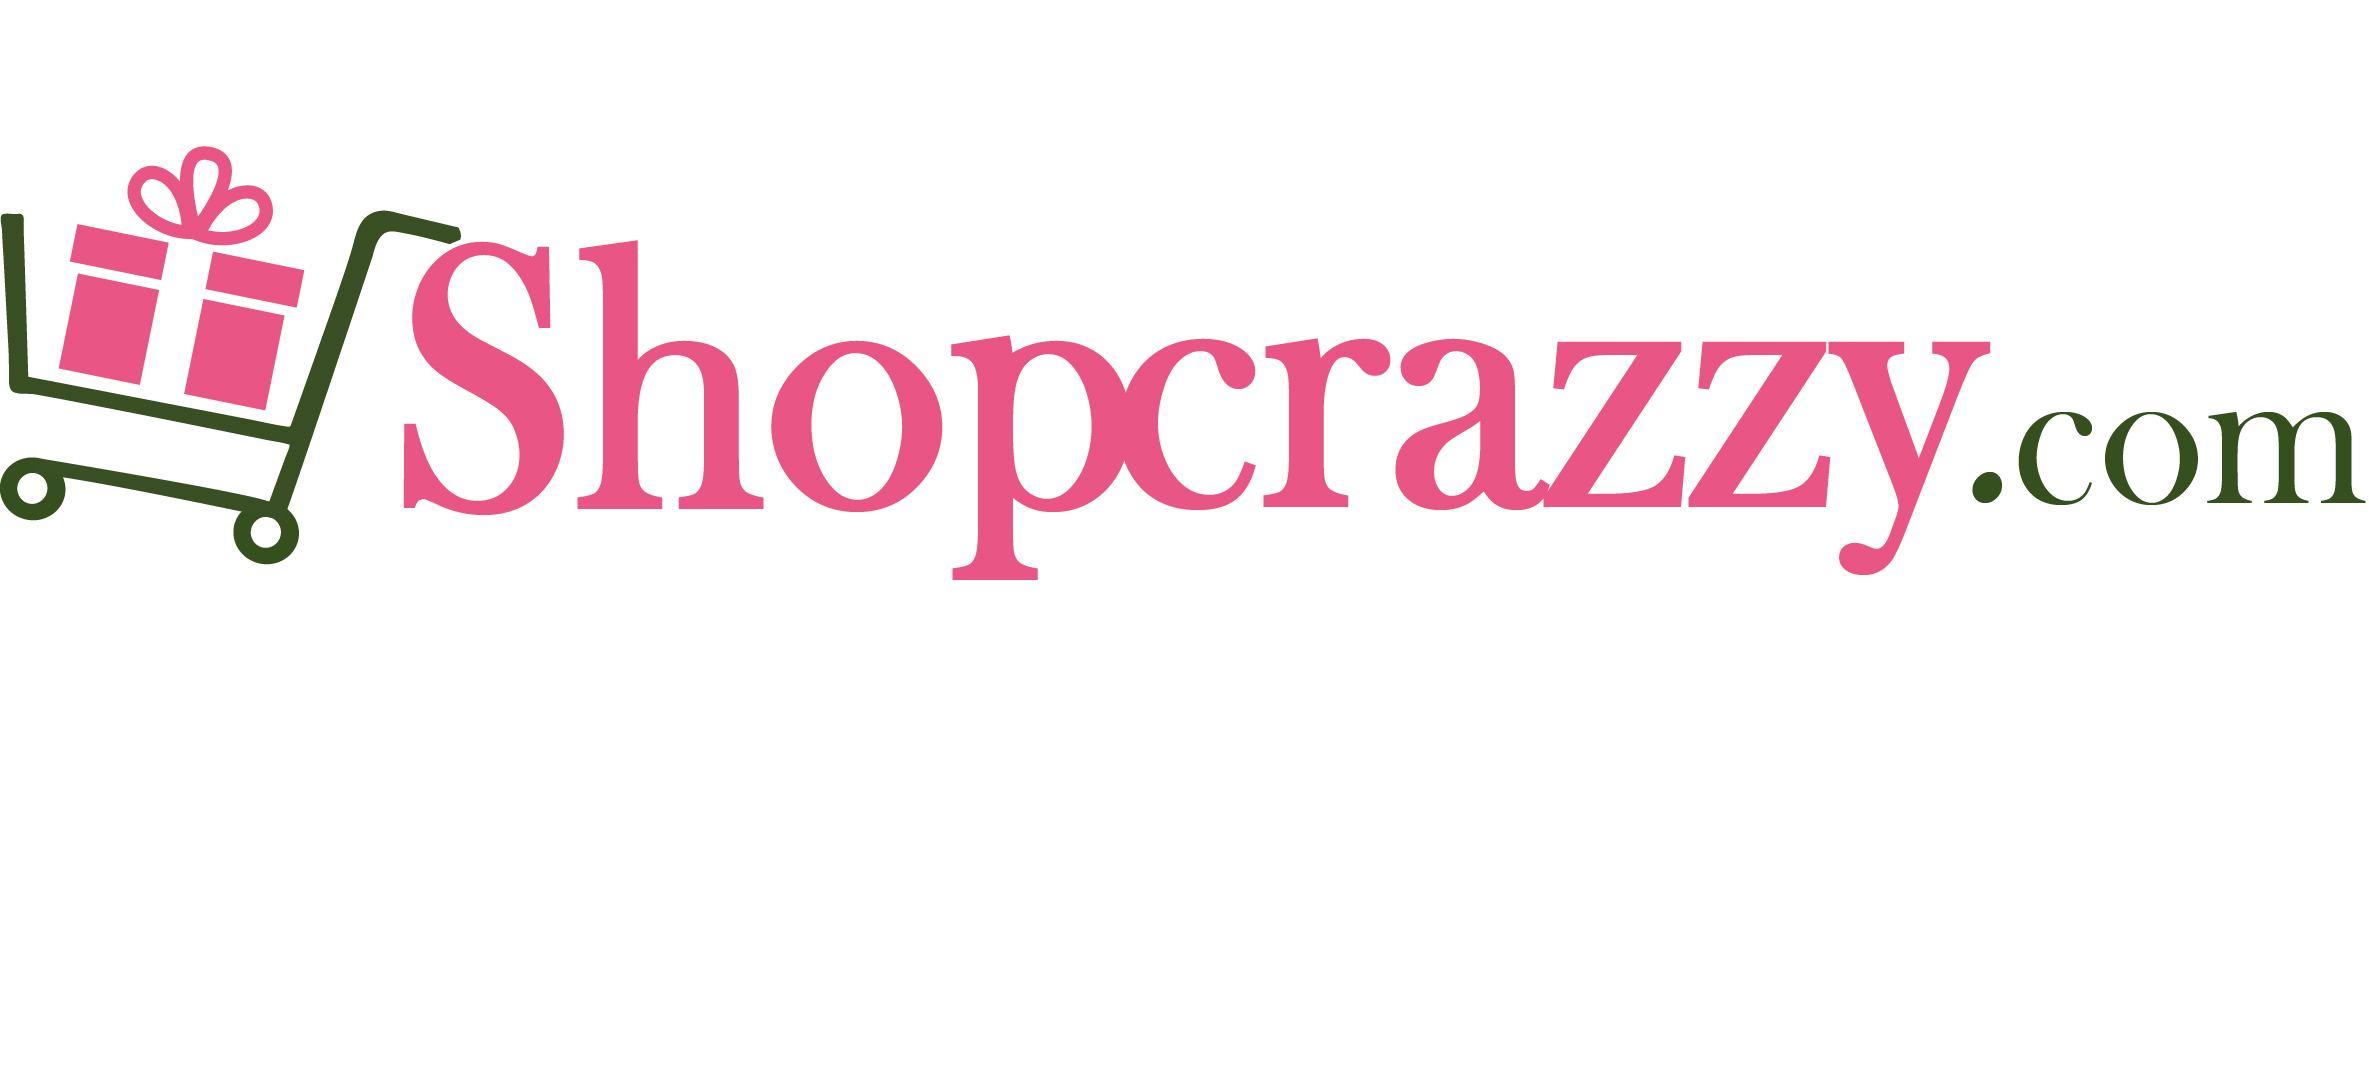 Dream Shopping Logo